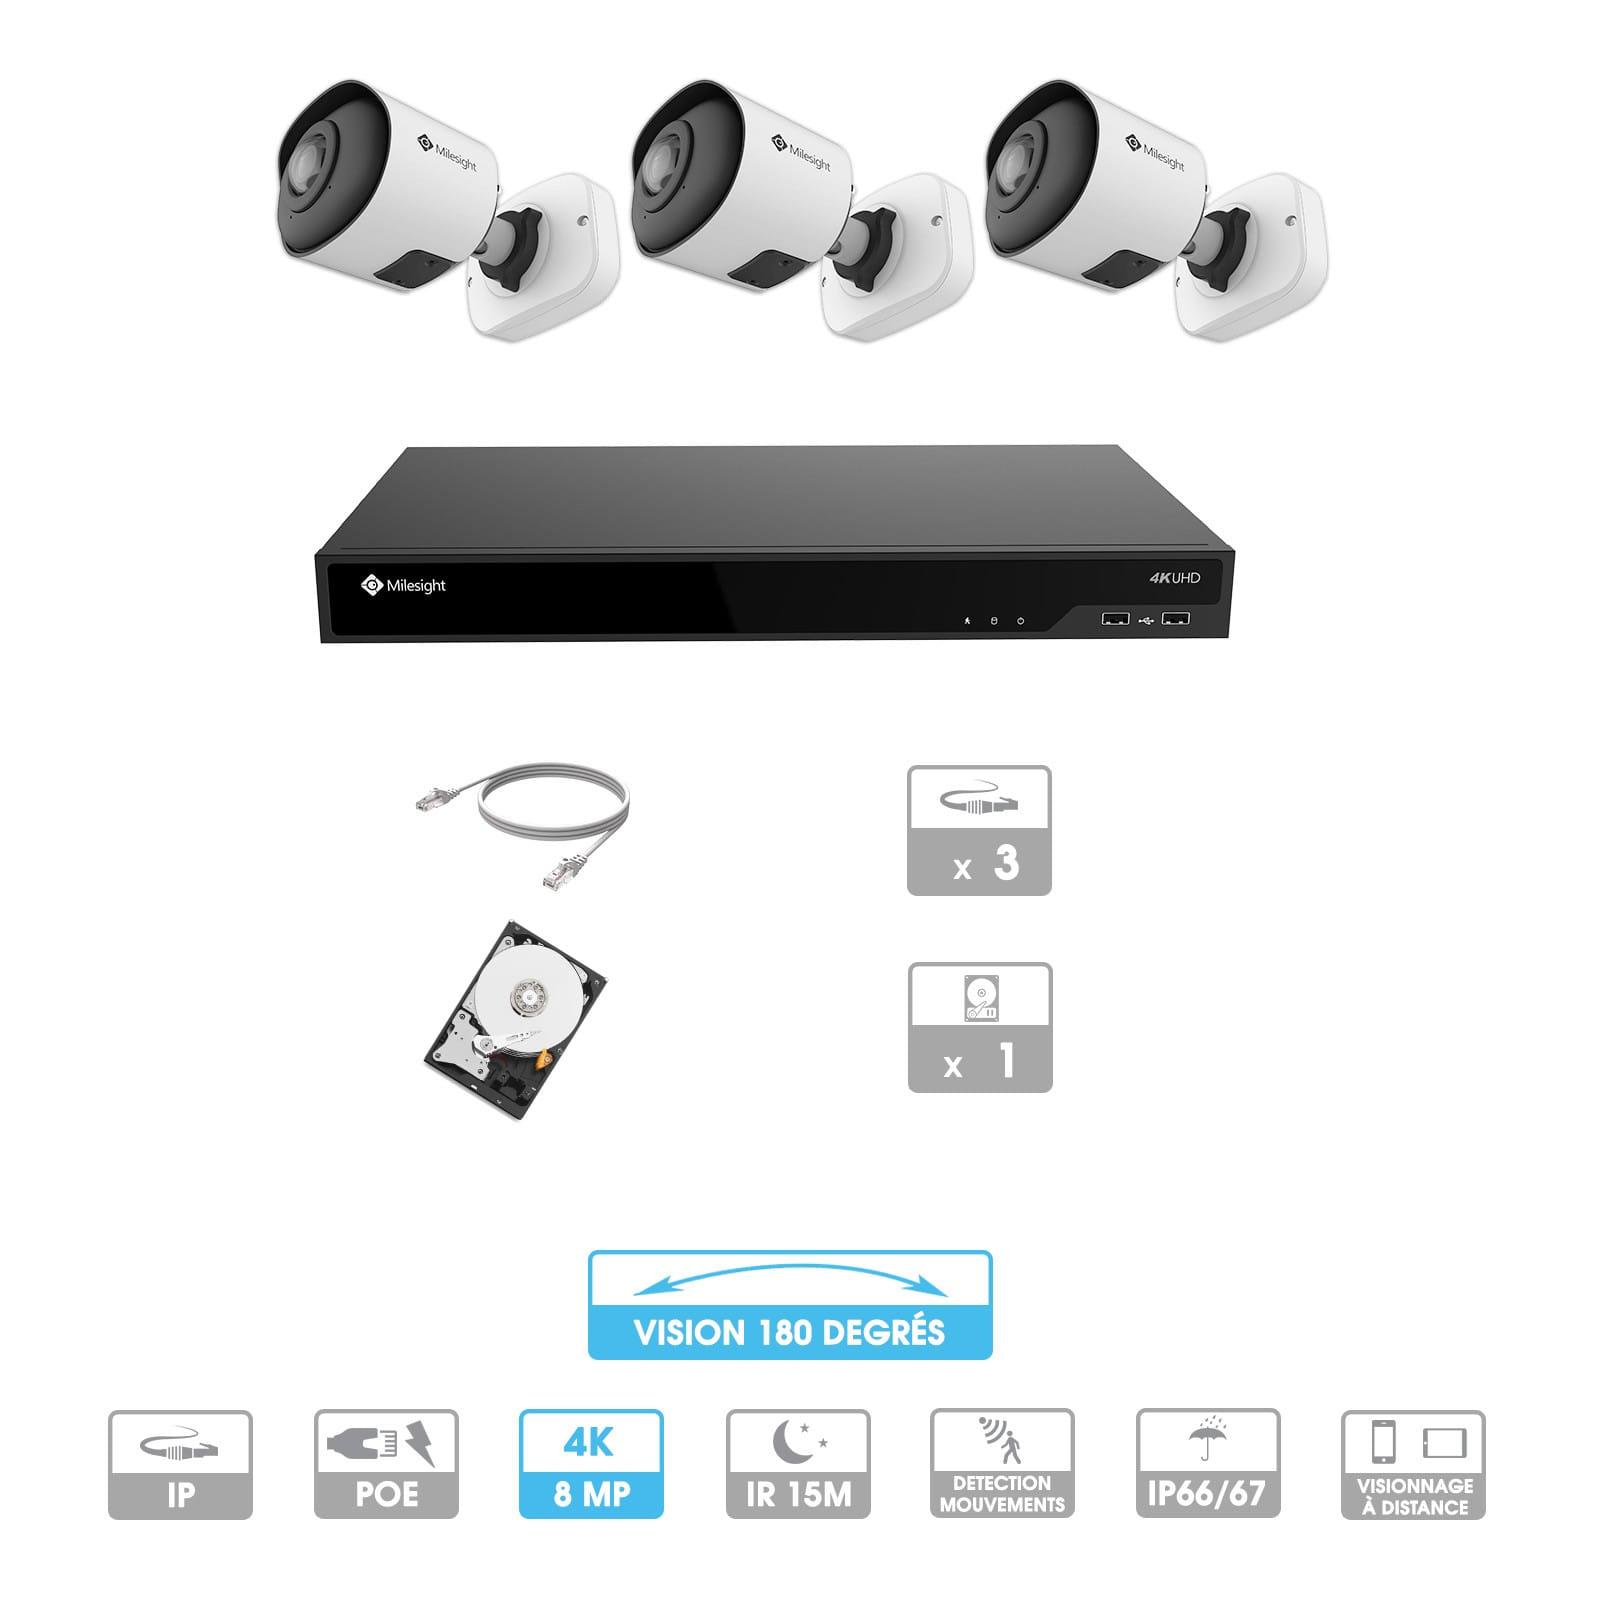 Kit vidéosurveillance 3 caméras 180° | 4K | IP PoE | 3 câbles RJ45 20/30/40/50 mètres | HDD 1 à 6 To | Tube Milesight